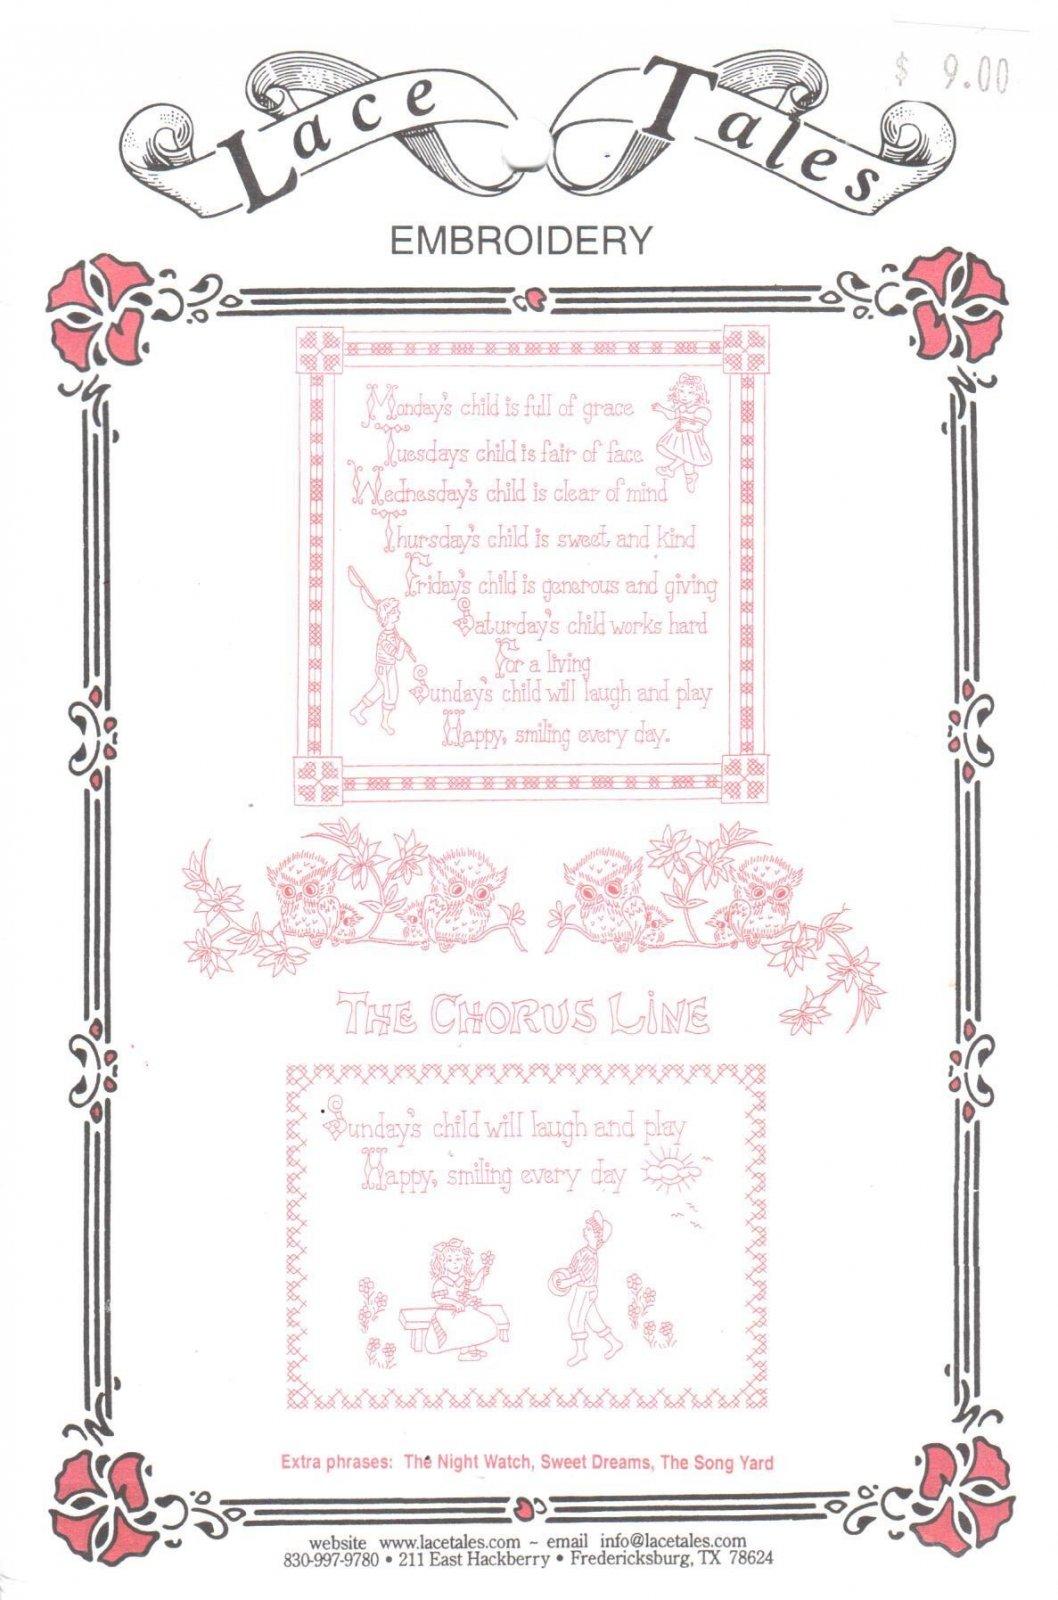 Embroidery - Lyrics 26